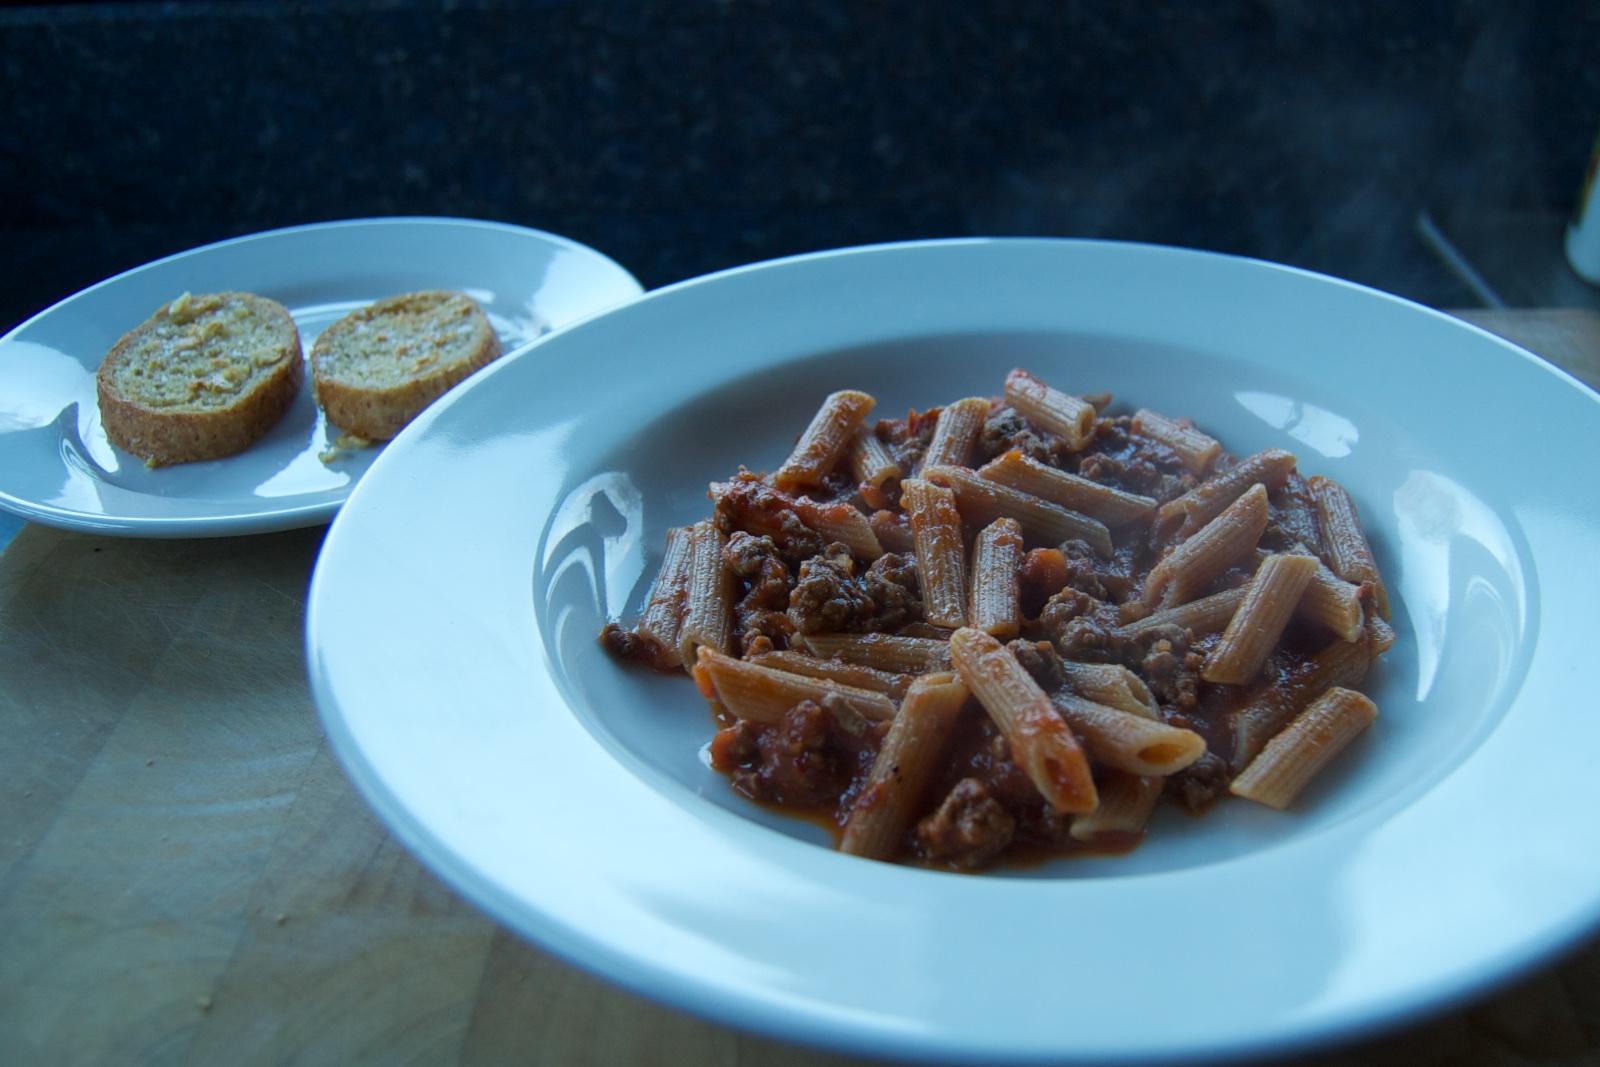 http://blog.rickk.com/food/2014/11/11/ate.2014.11.11.d.jpg